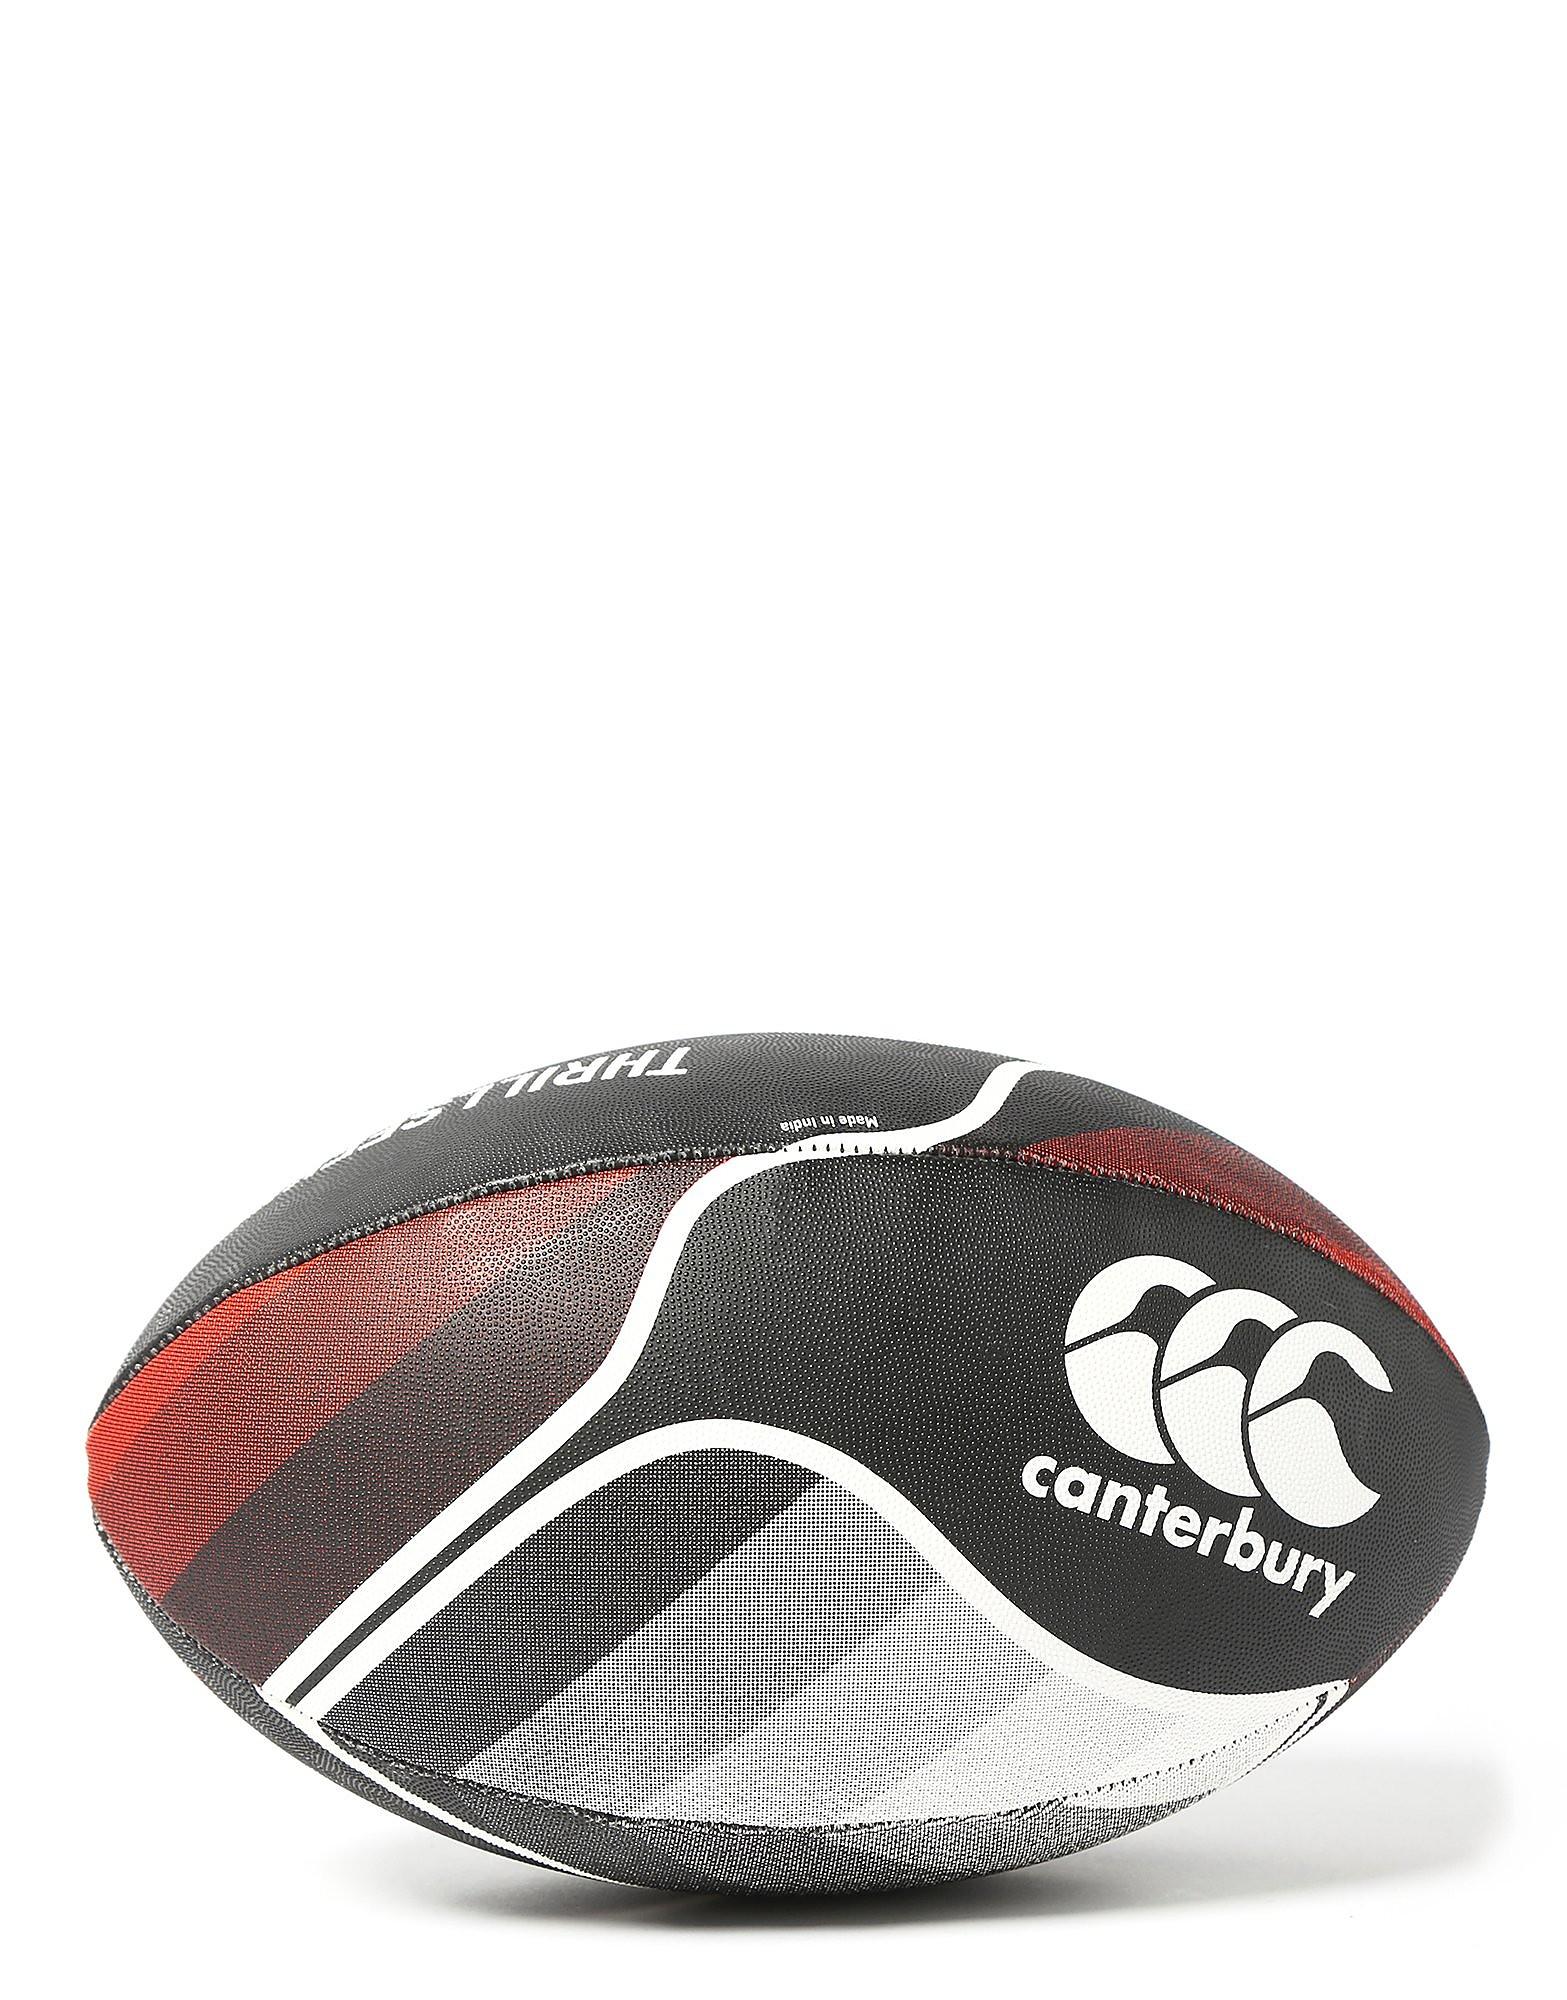 Canterbury Brand Thrillseeker Rugby Ball